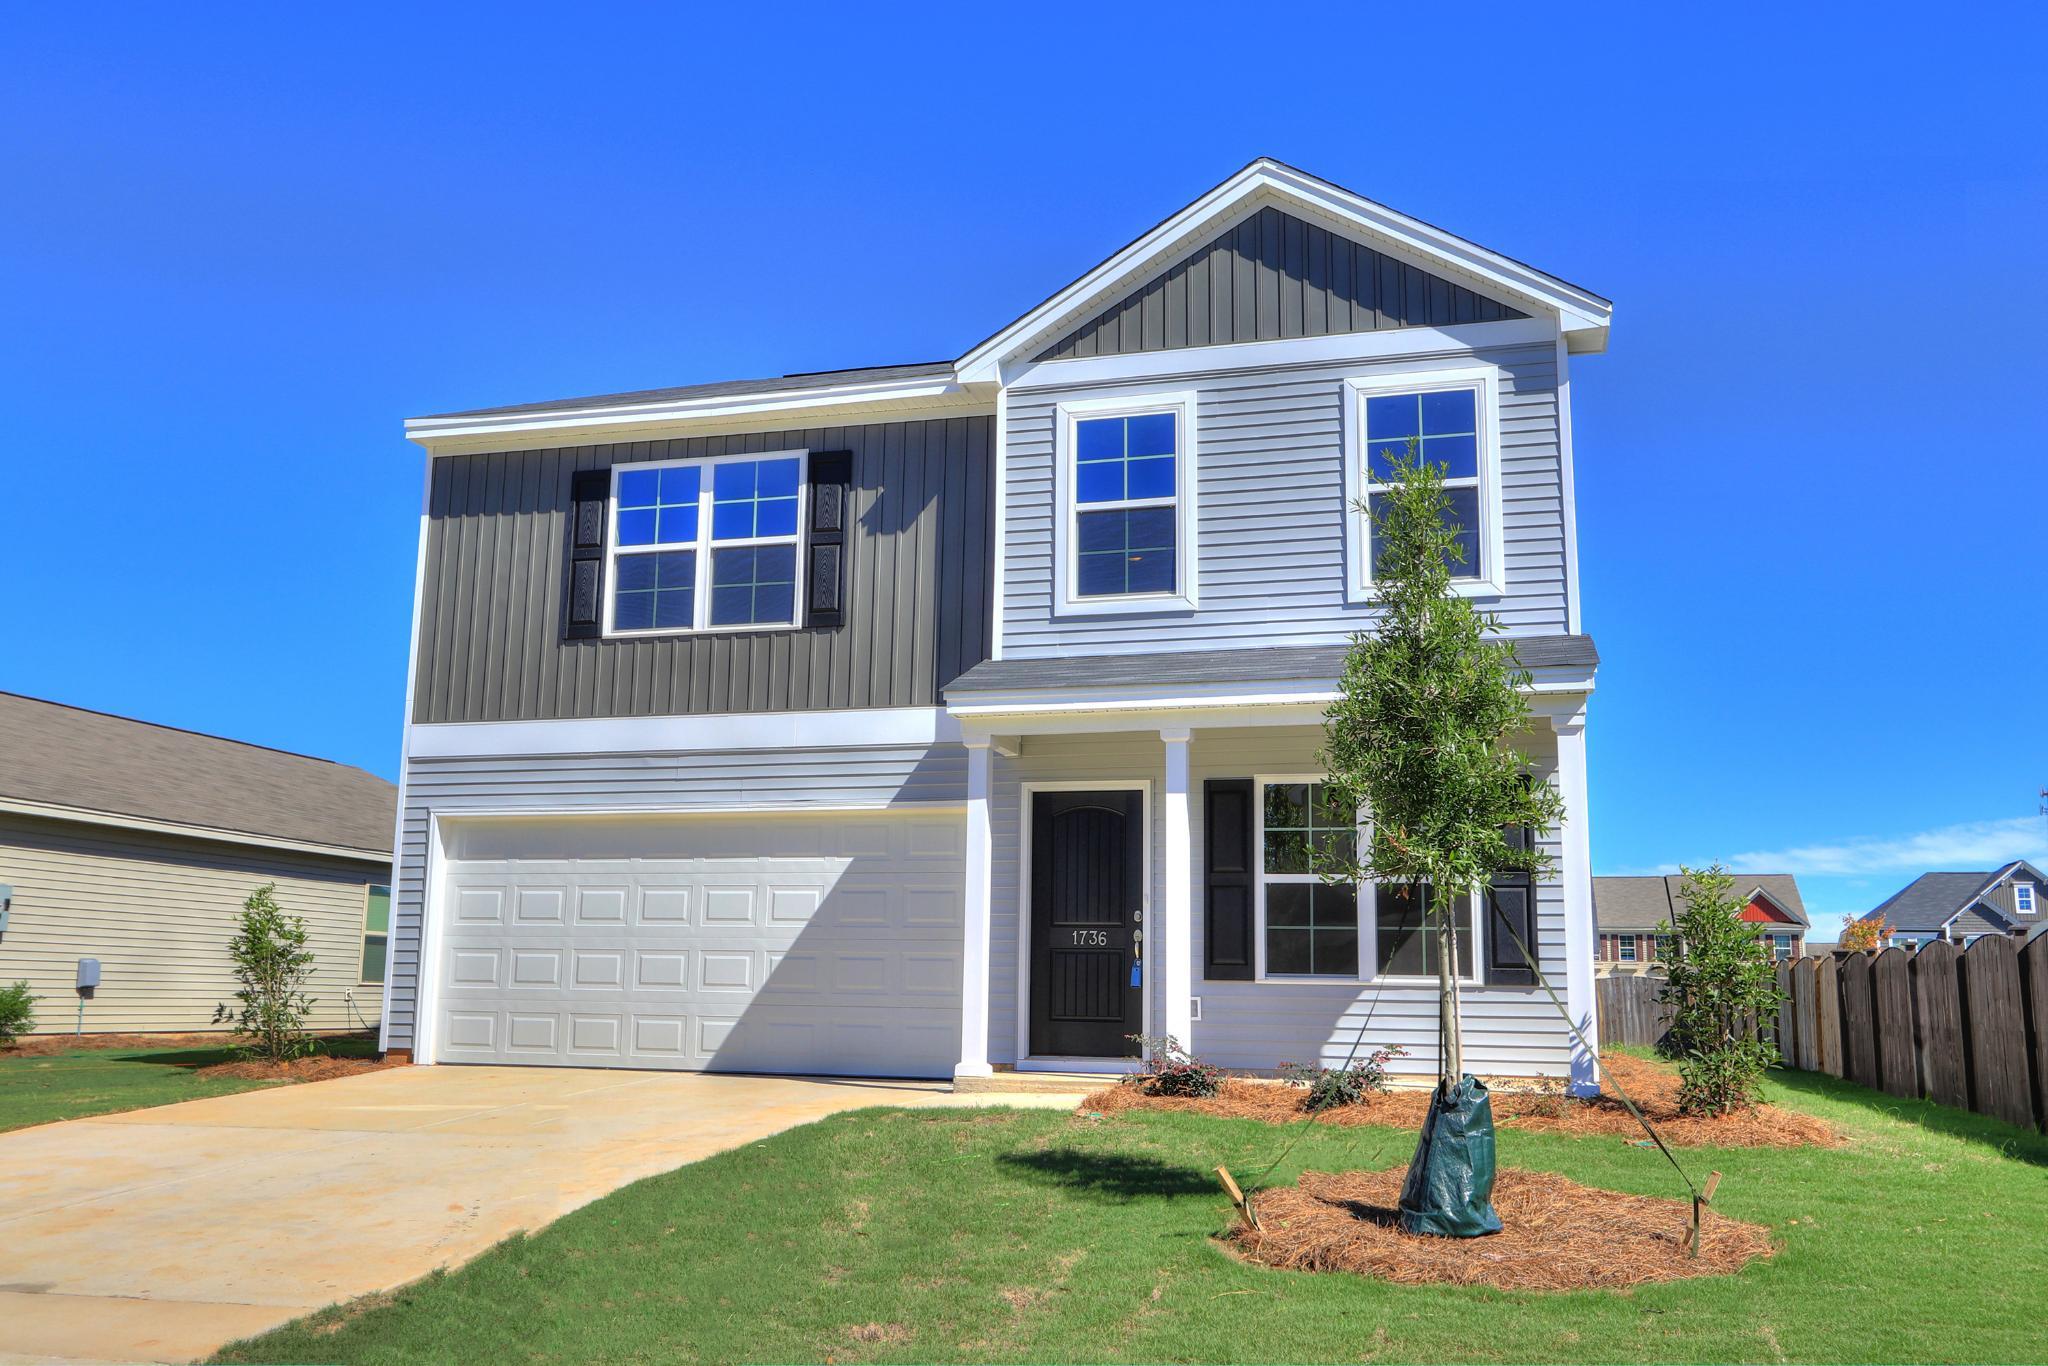 Mungo Homes Patterson Floor Plan: Mungo Homes Greenville